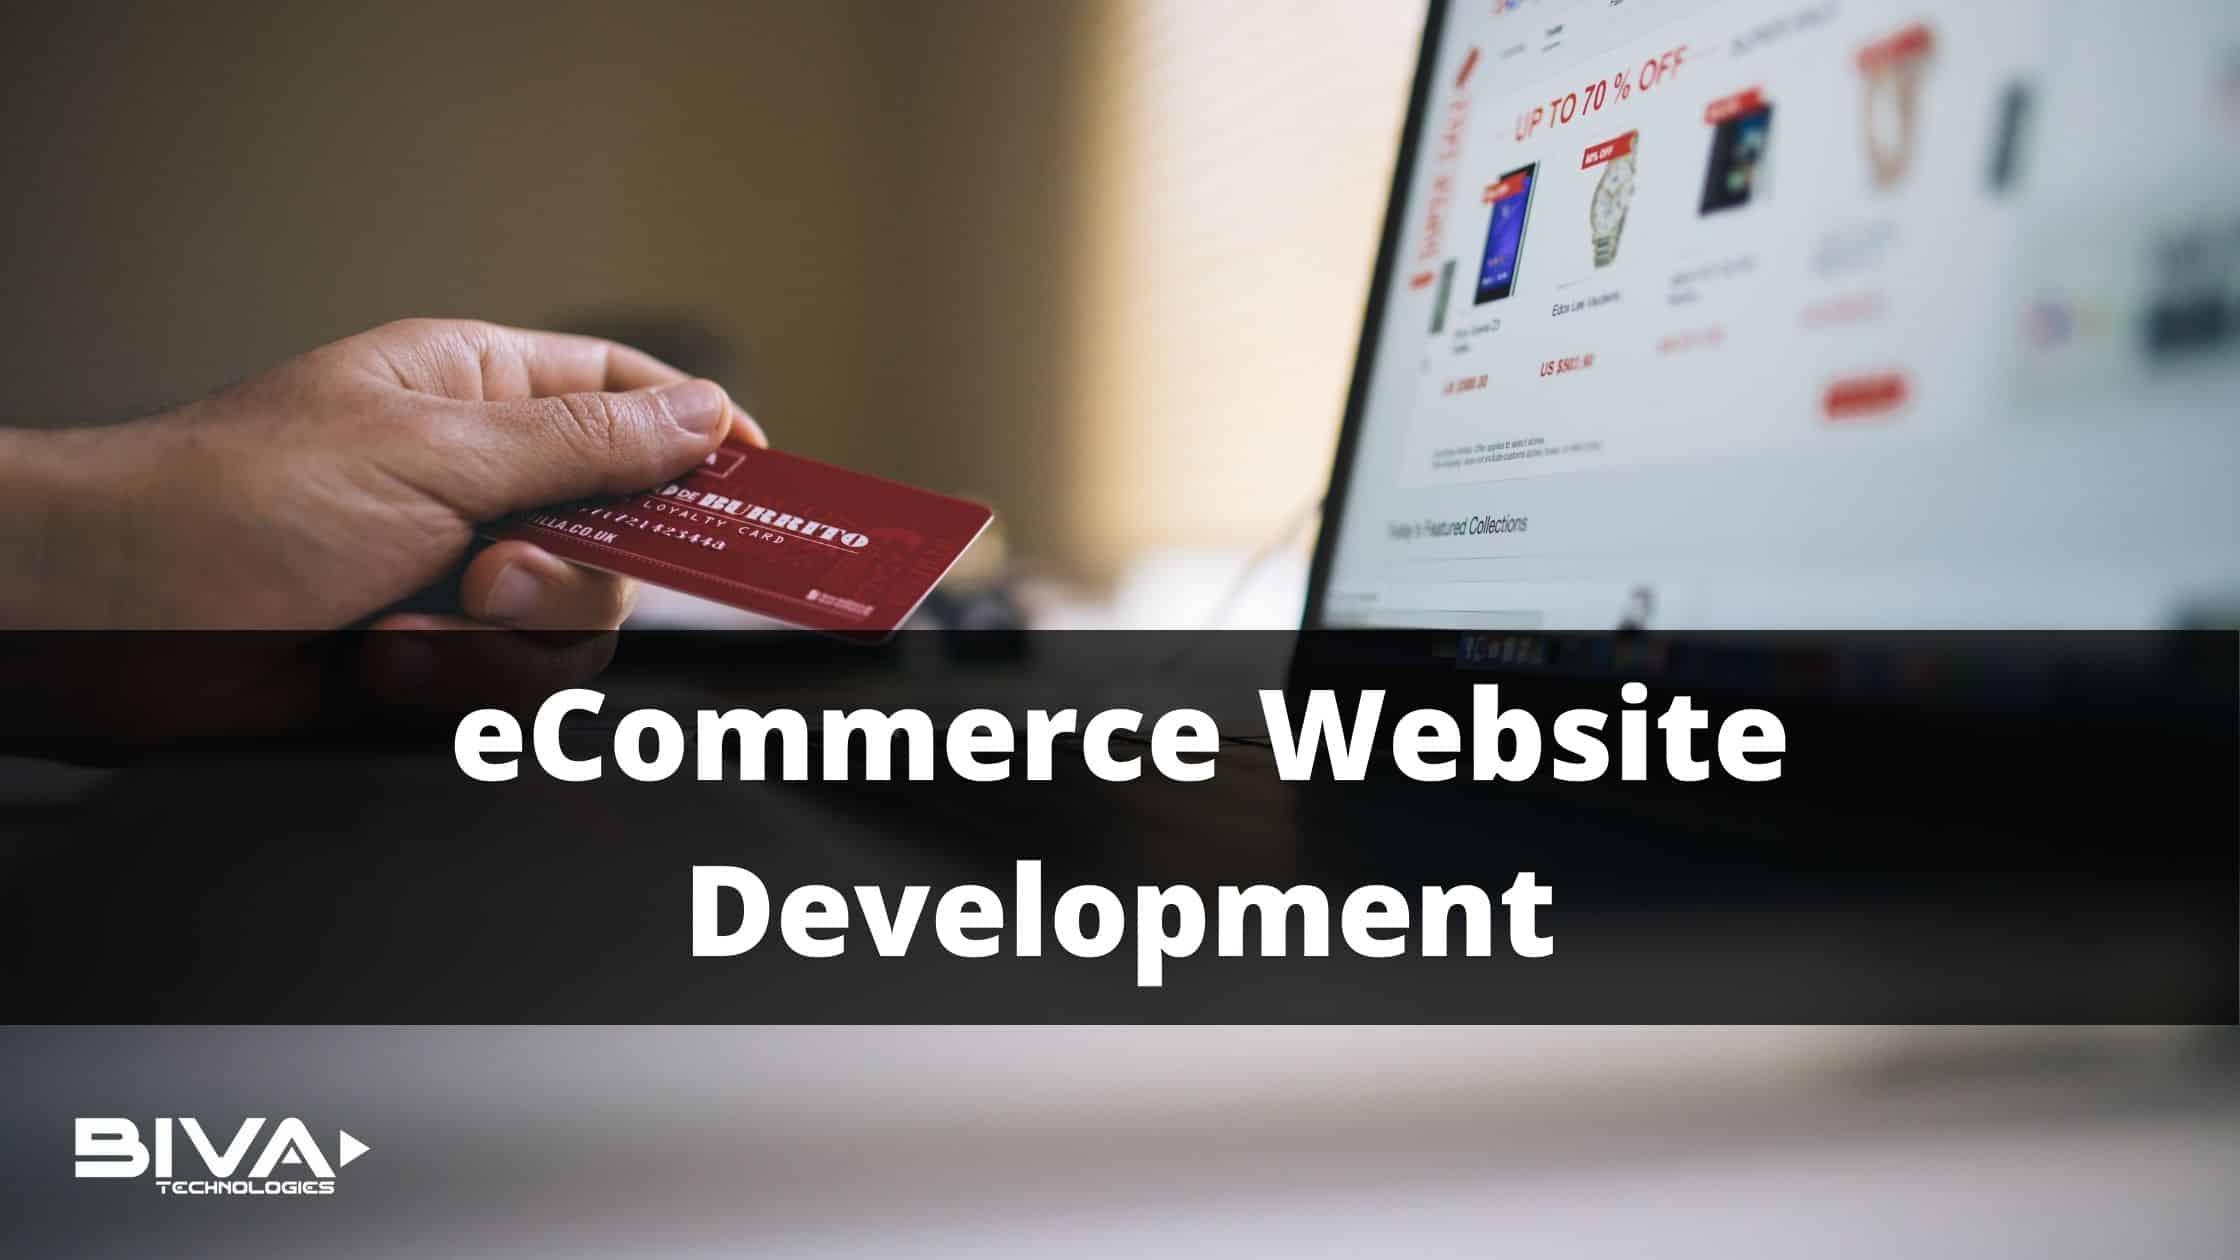 Start eCommerce Website Development in WordPress (15 min)